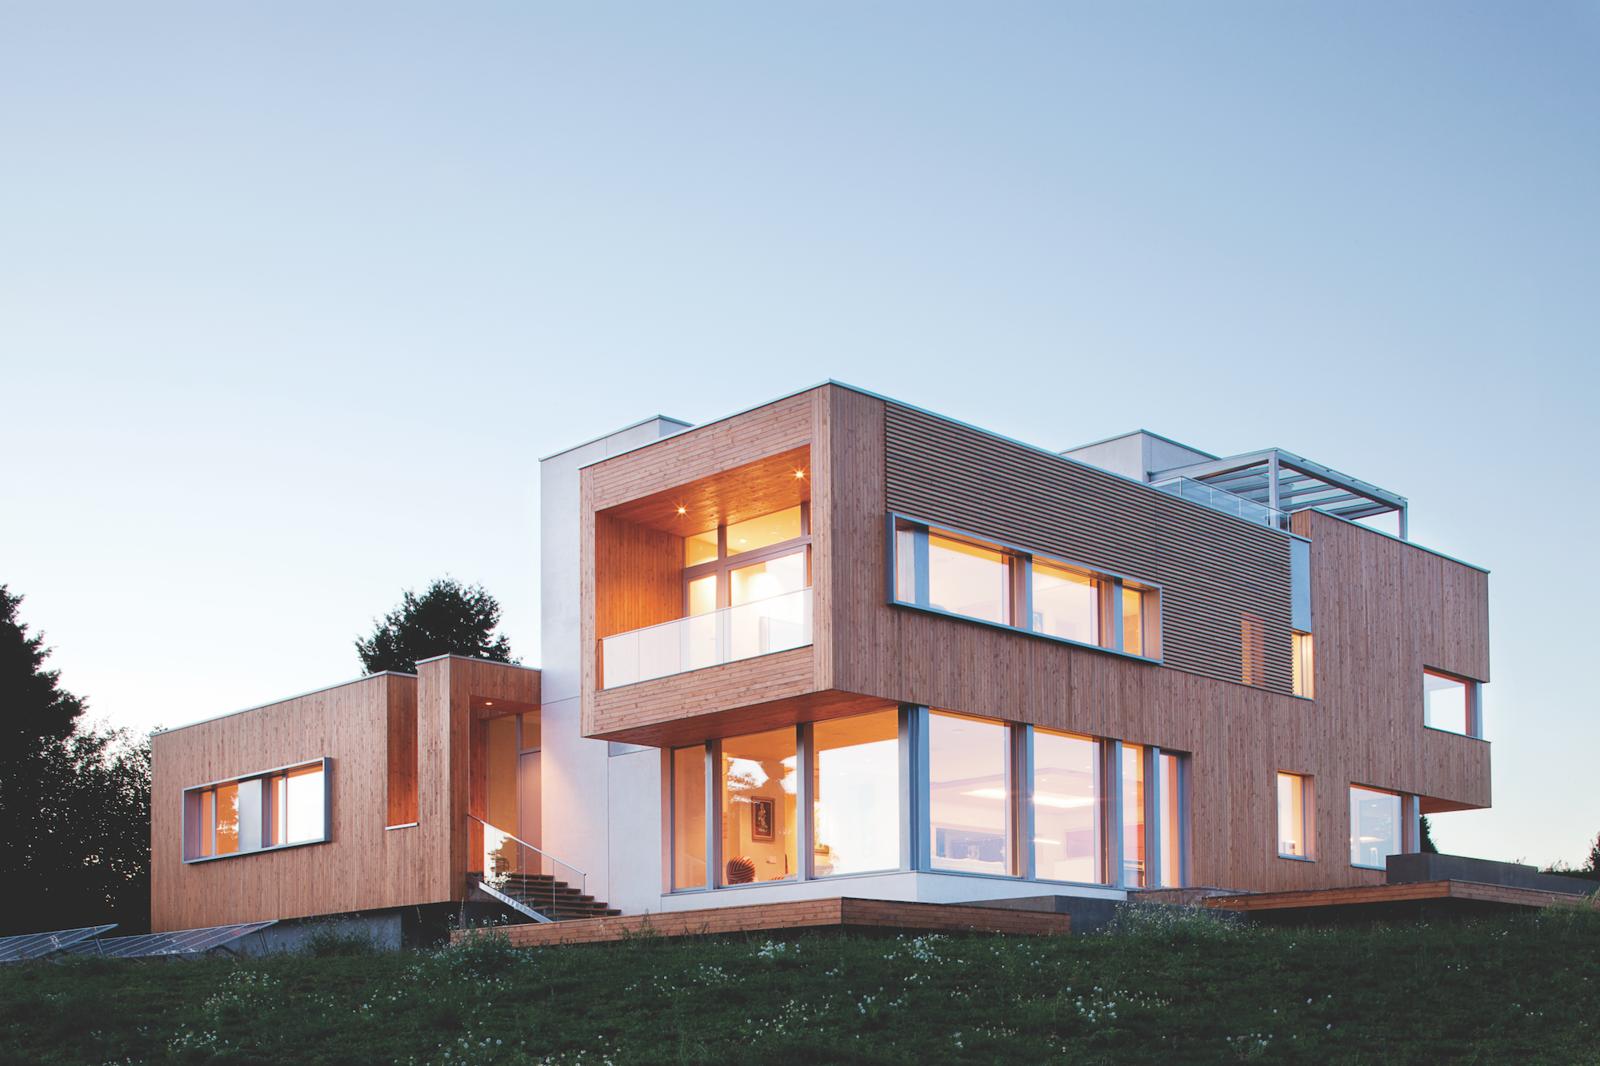 5 Stunning Uses of Western Red Cedar - Dwell